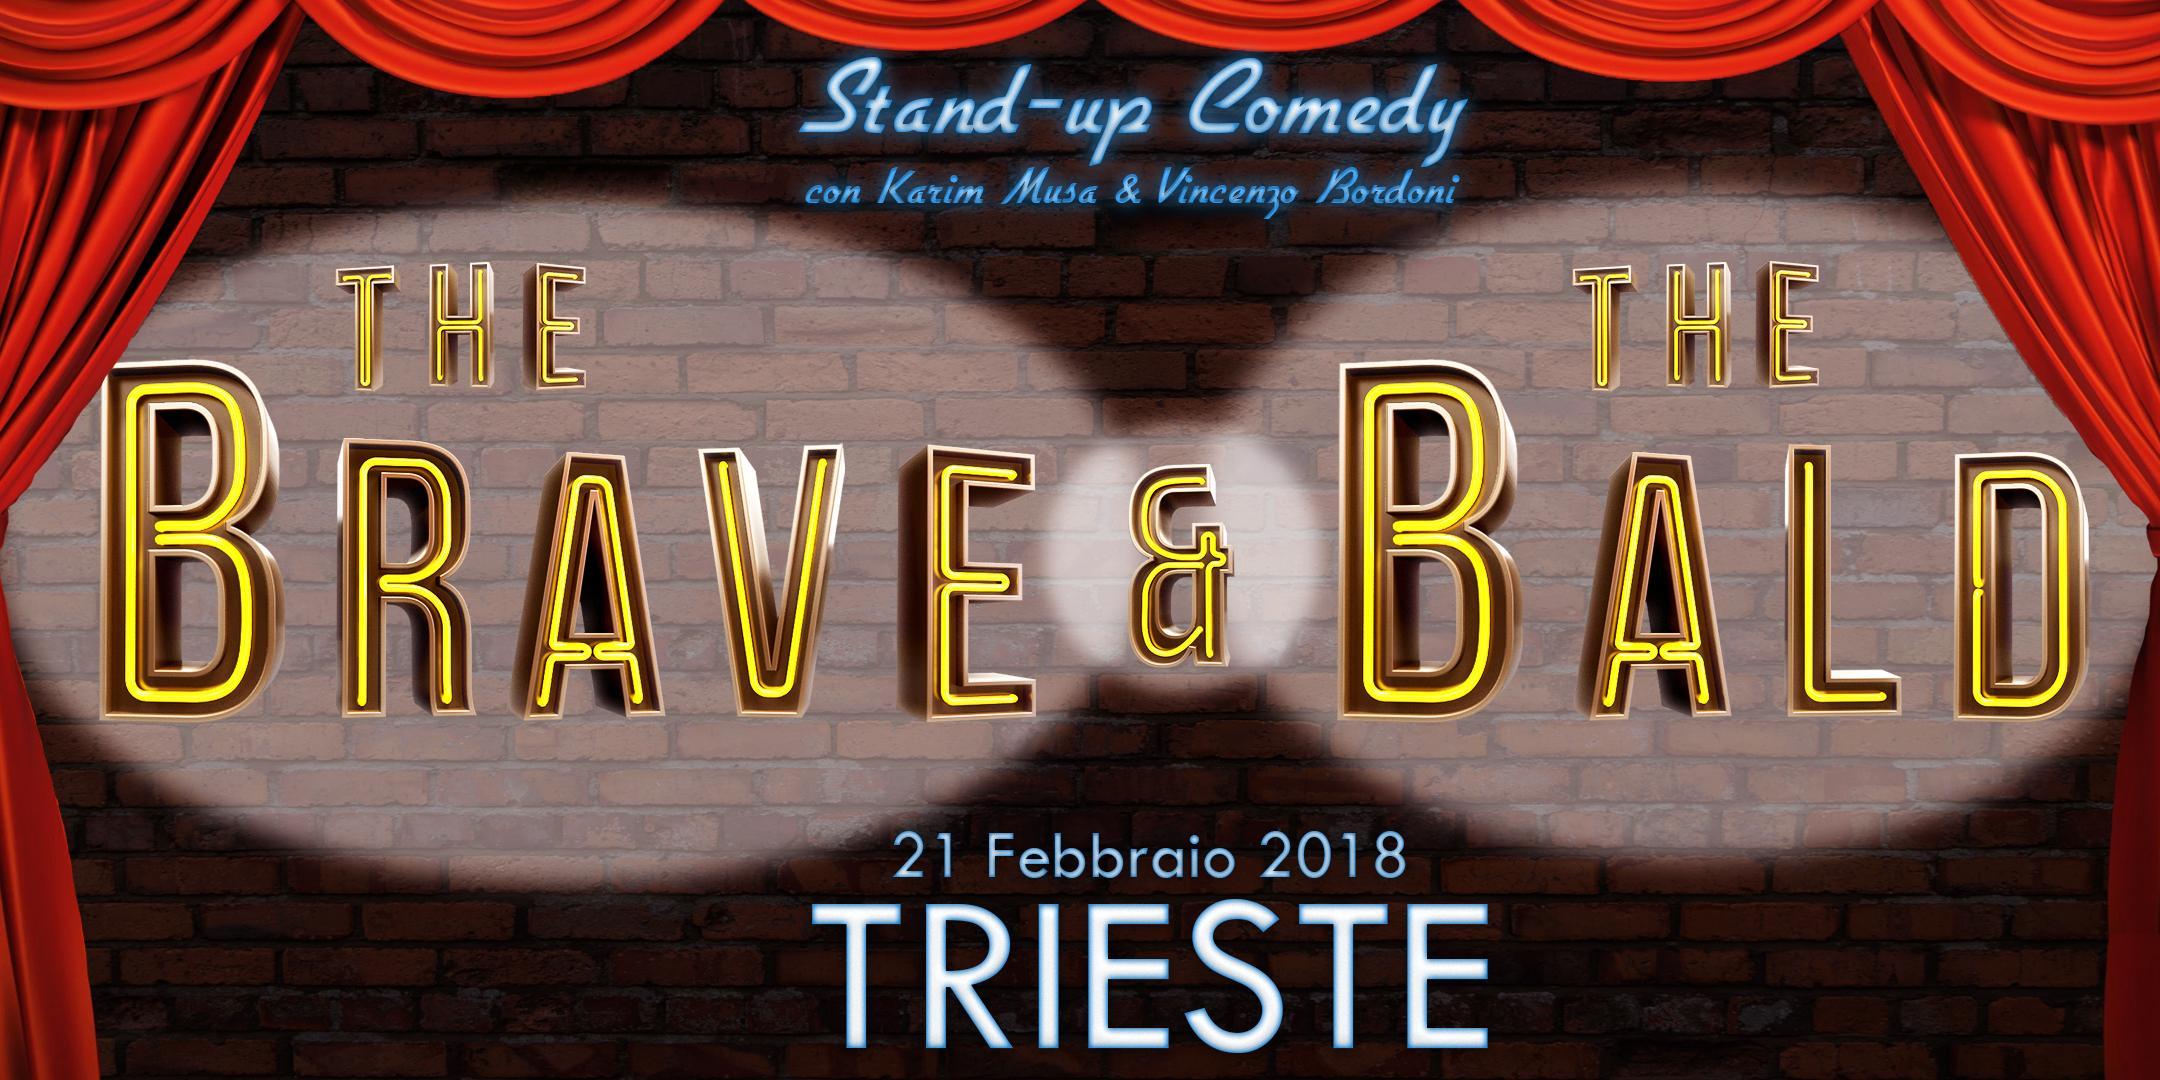 "TRIESTE 21-FEBBRAIO-2018 ""The Brave & The Bal"